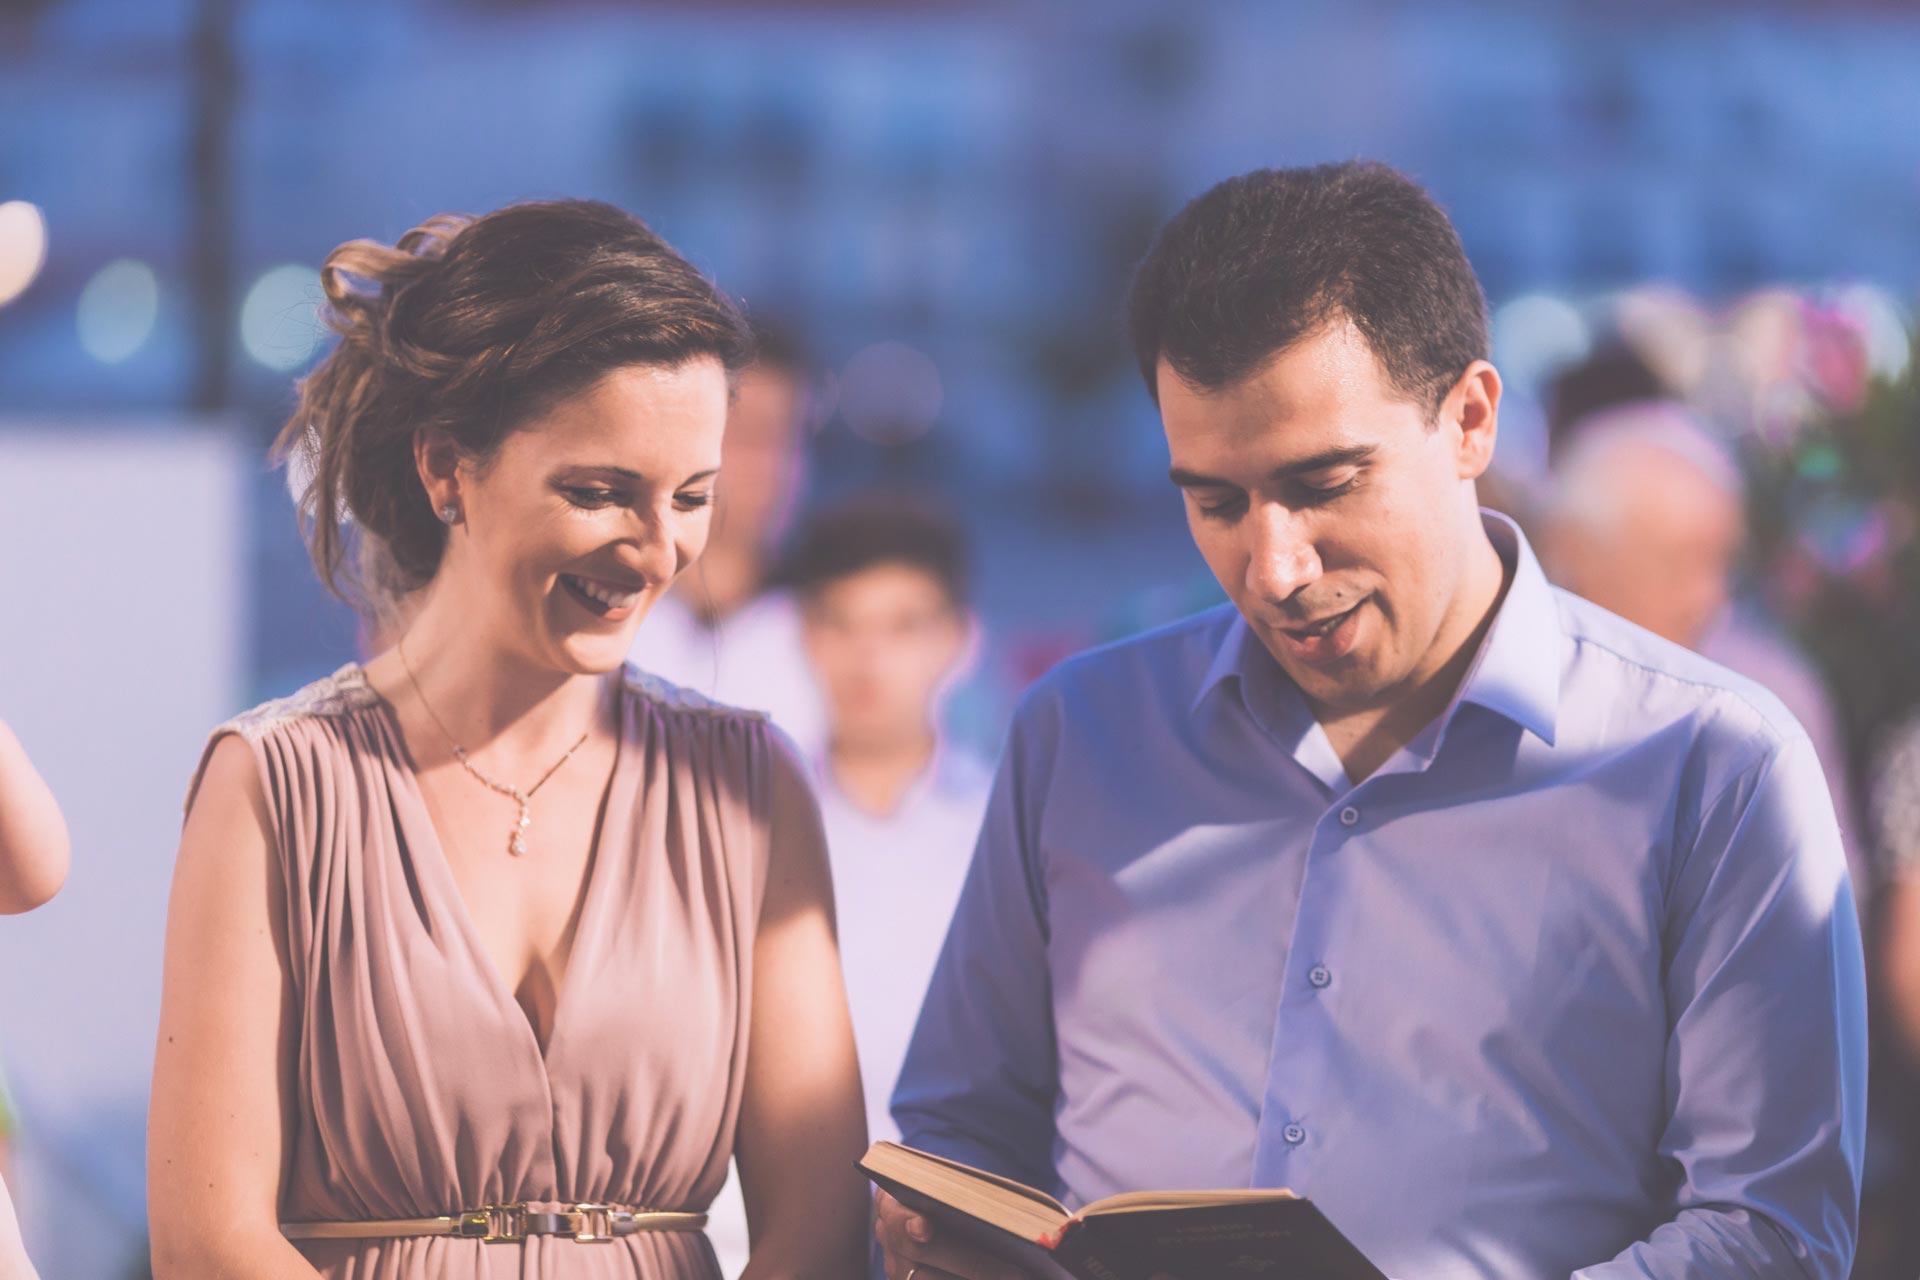 249 PhotoVaptisis Spetses vaptisi βαπτιση μωρο βαπτιστικά βαπριση σπετσες αγιος μαμας διακοσμηση βάπτισης γονείς νονά